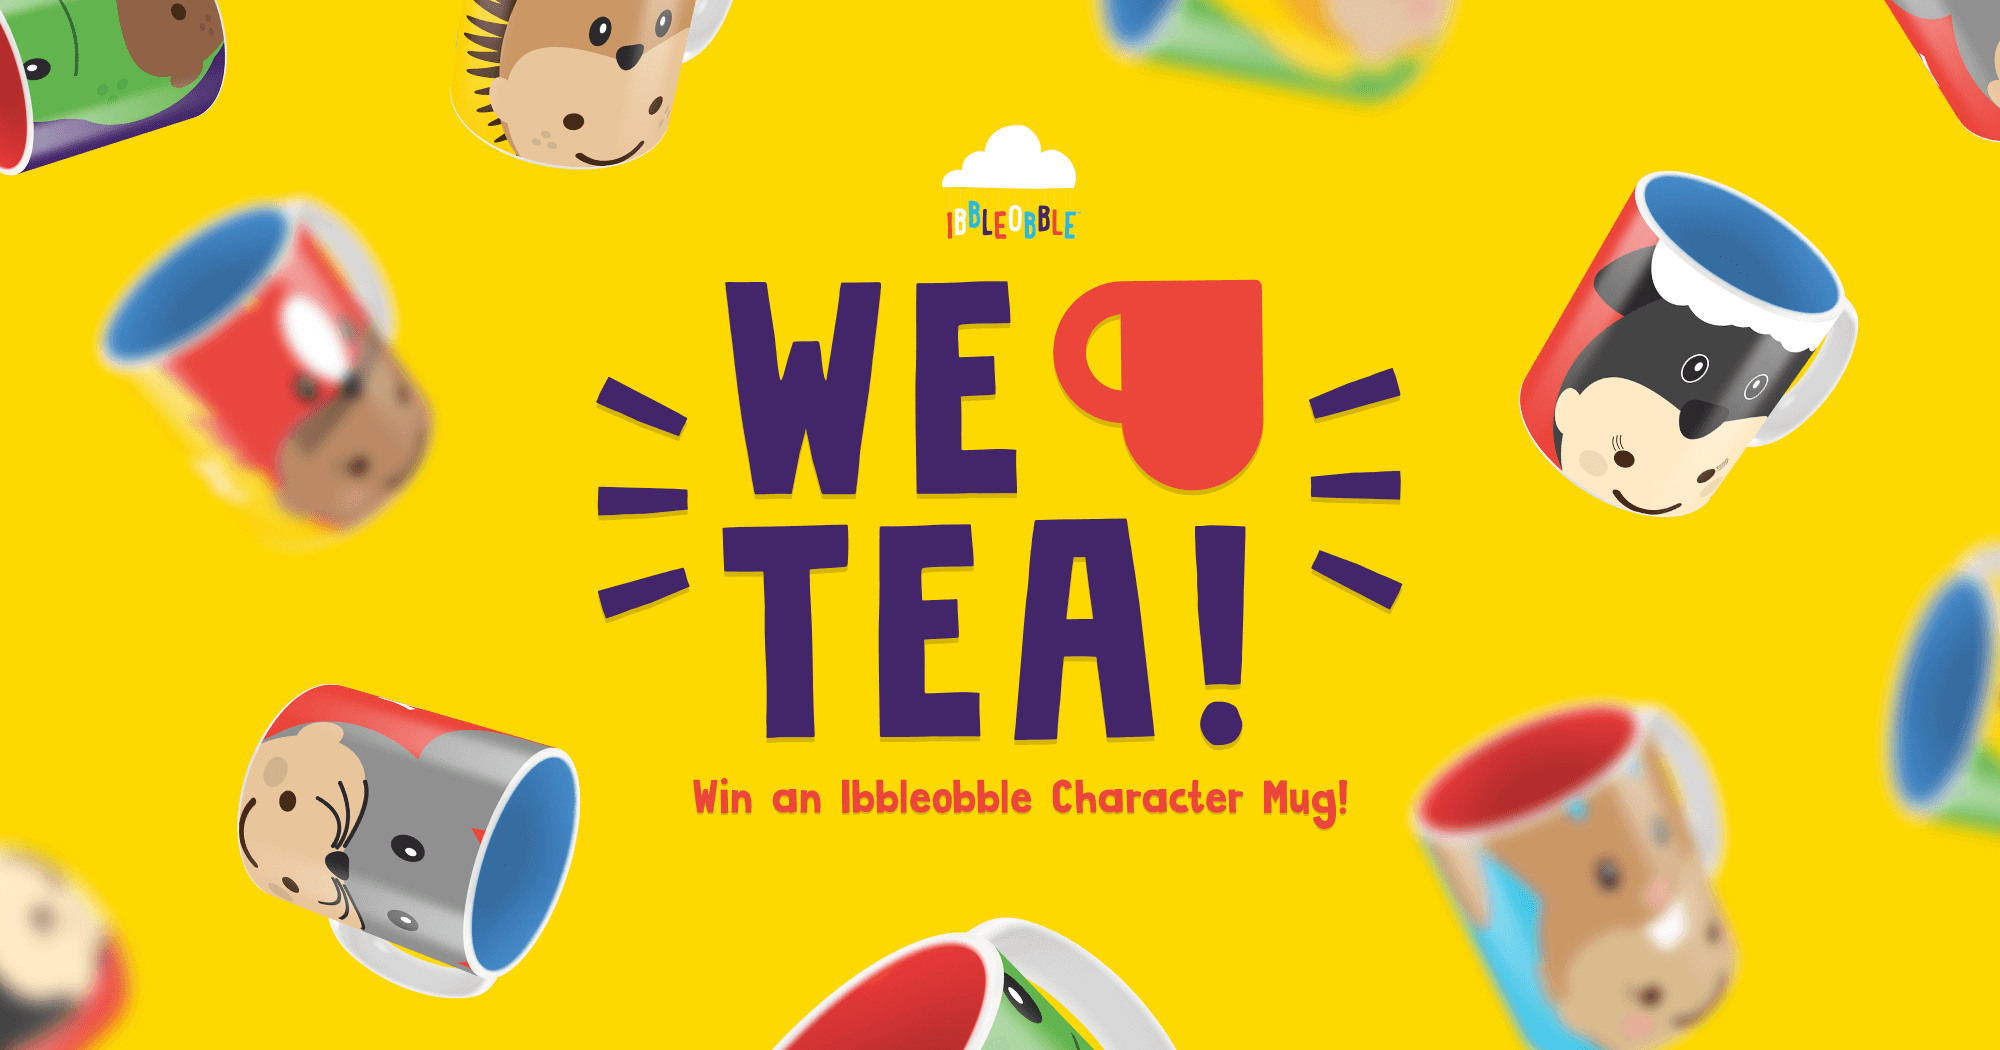 Win an Ibbleobble Character Mug